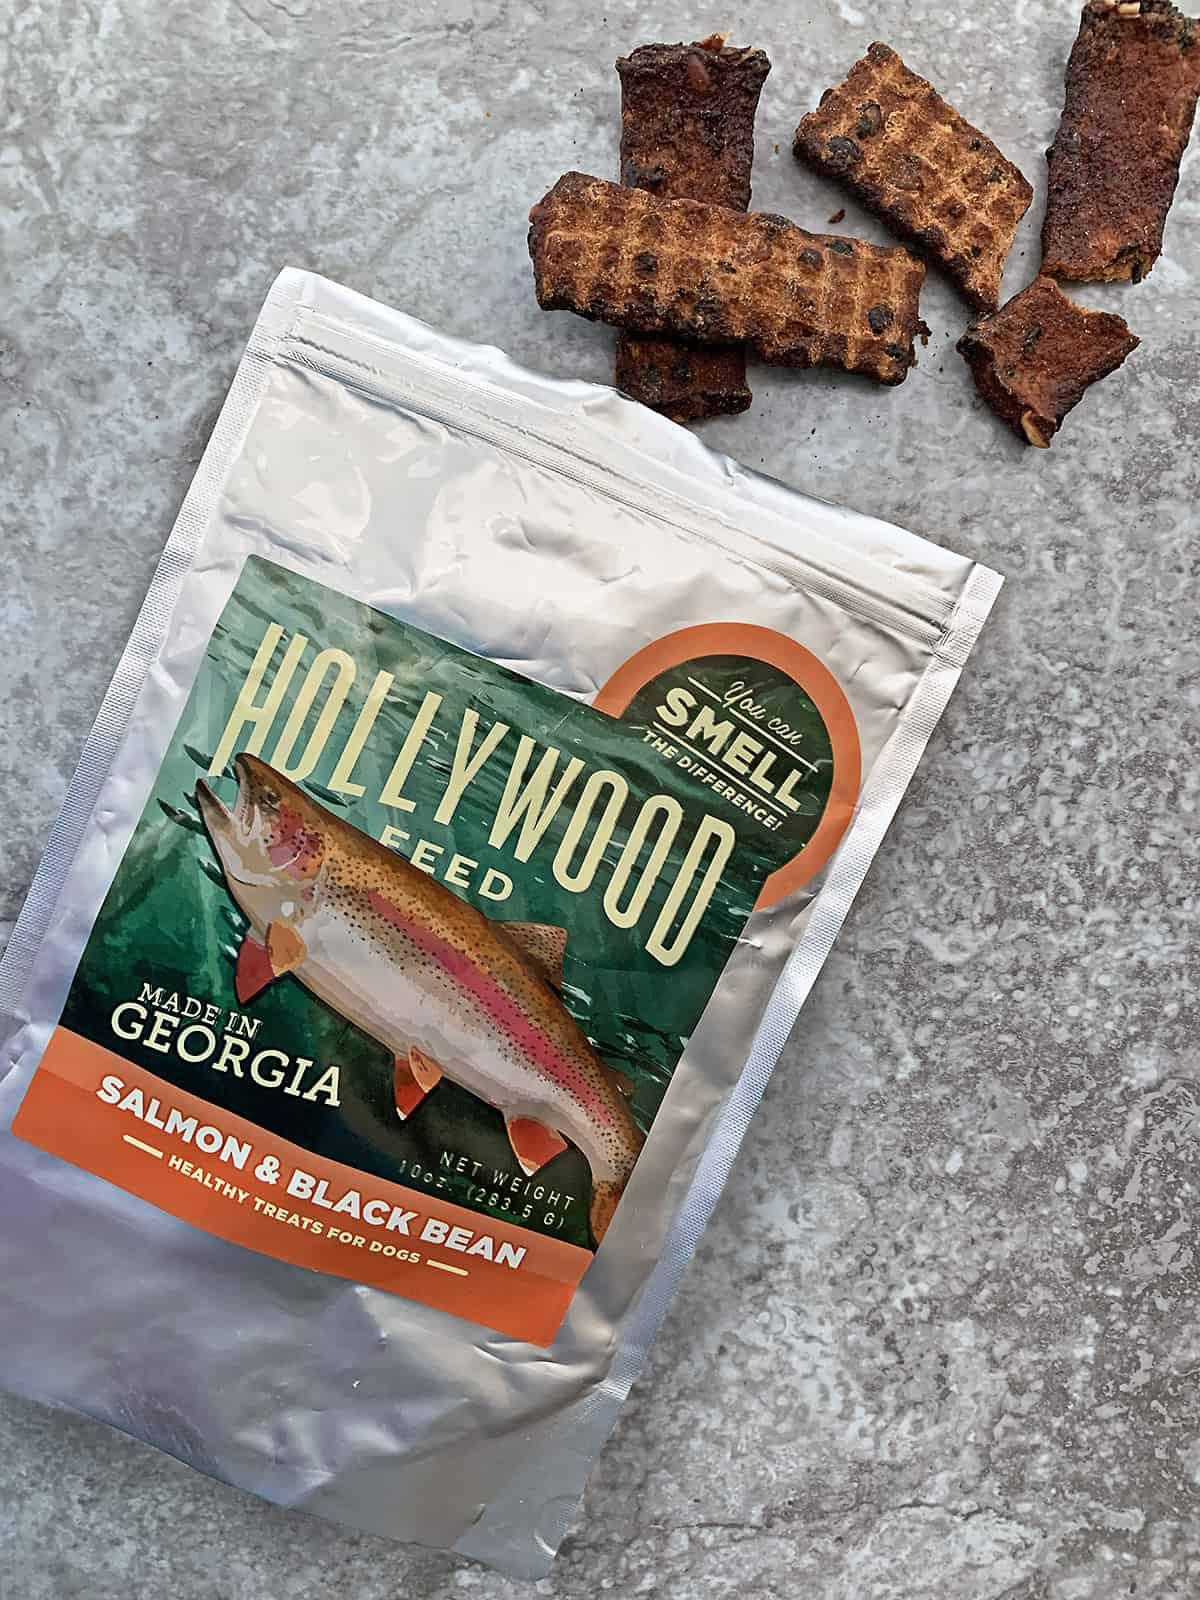 Hollywood Feed Salmon Black Bean Jerky